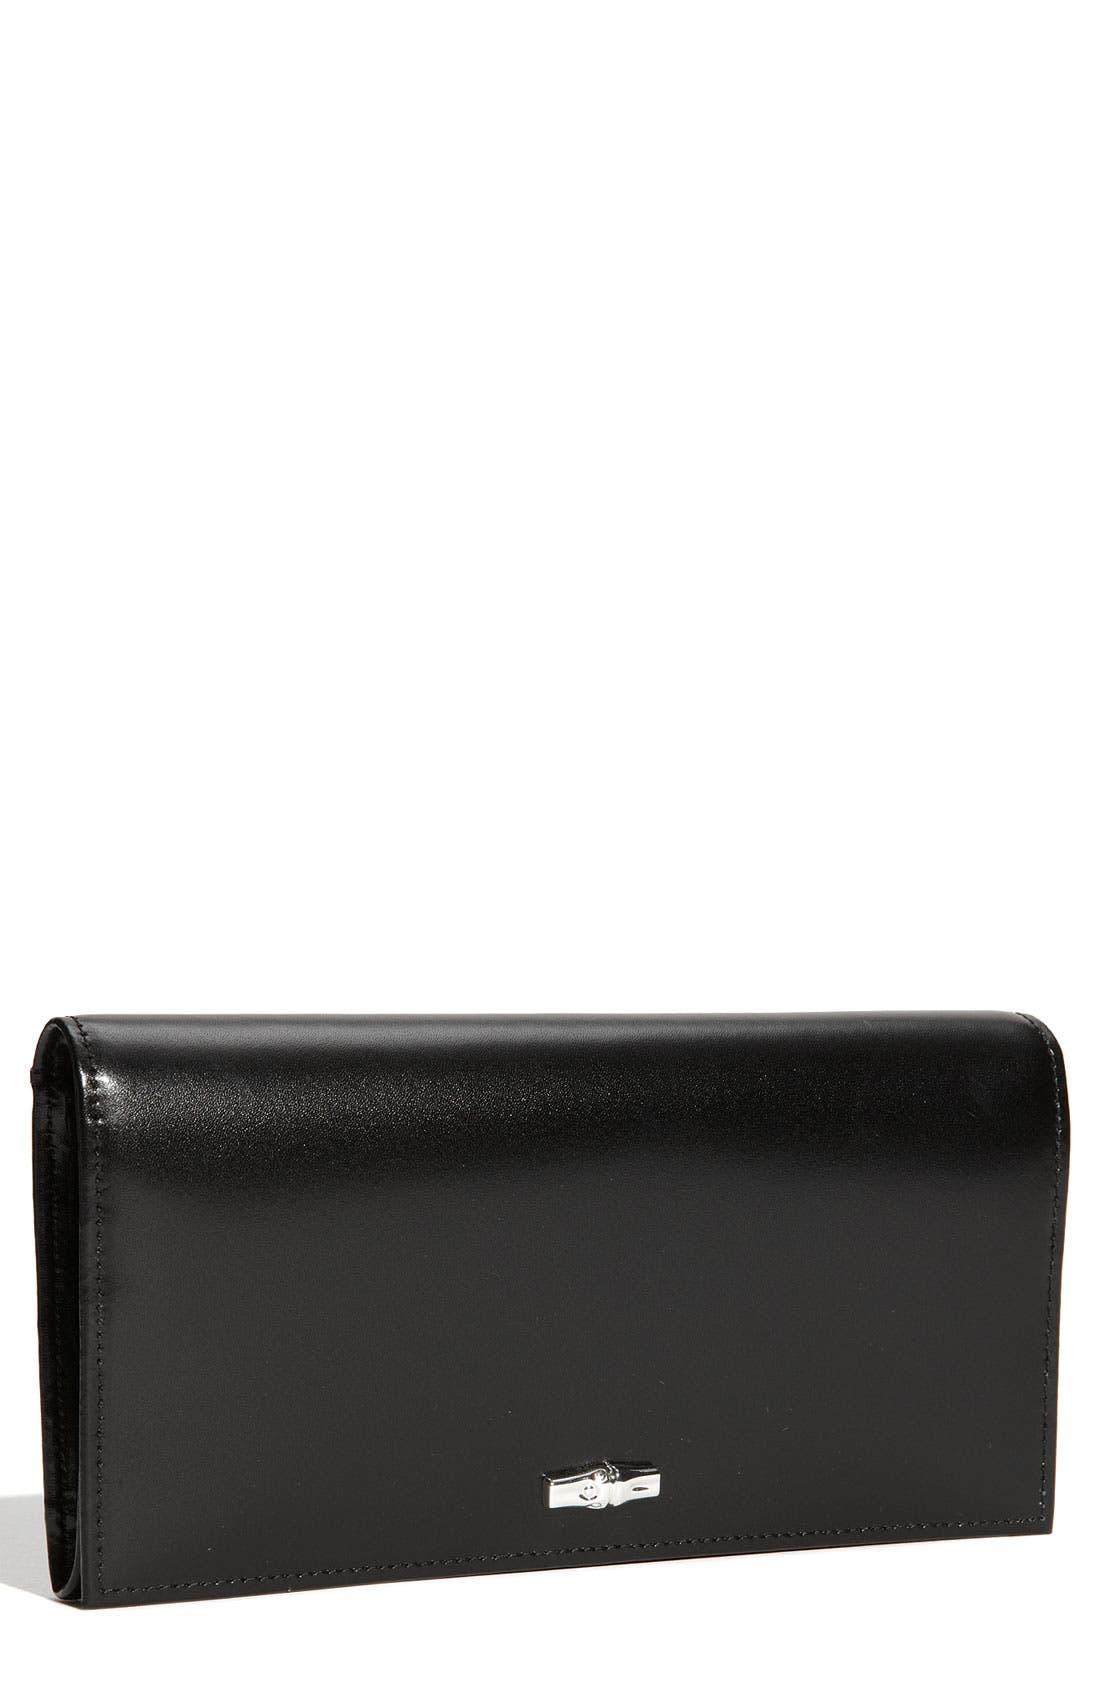 Main Image - Longchamp 'Roseau' Wallet